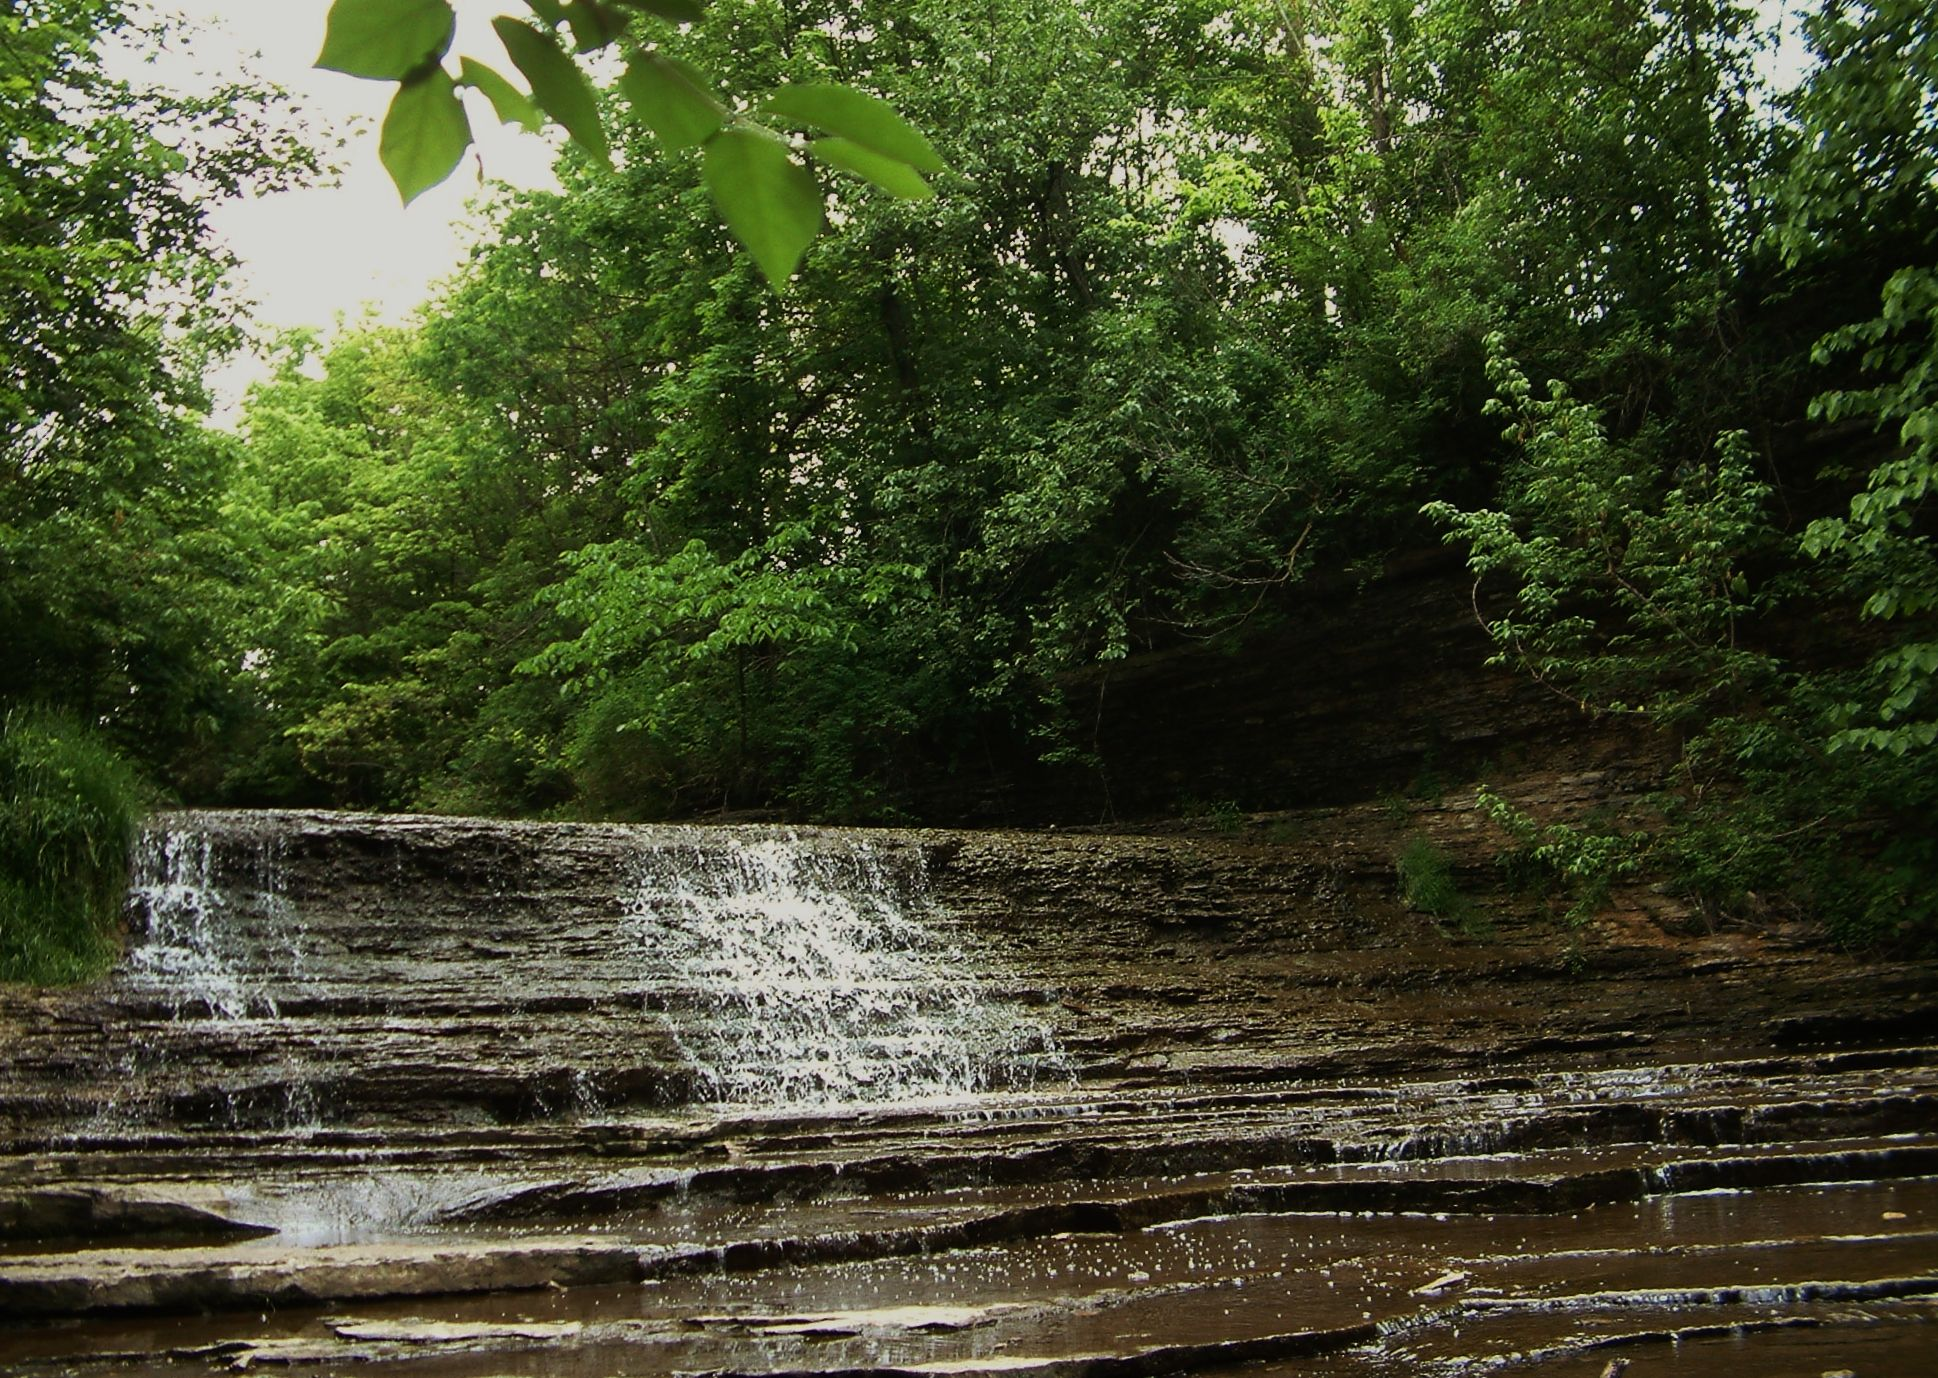 Falls In Wabash Indiana City Park Indiana Cities Park City Wabash Indiana